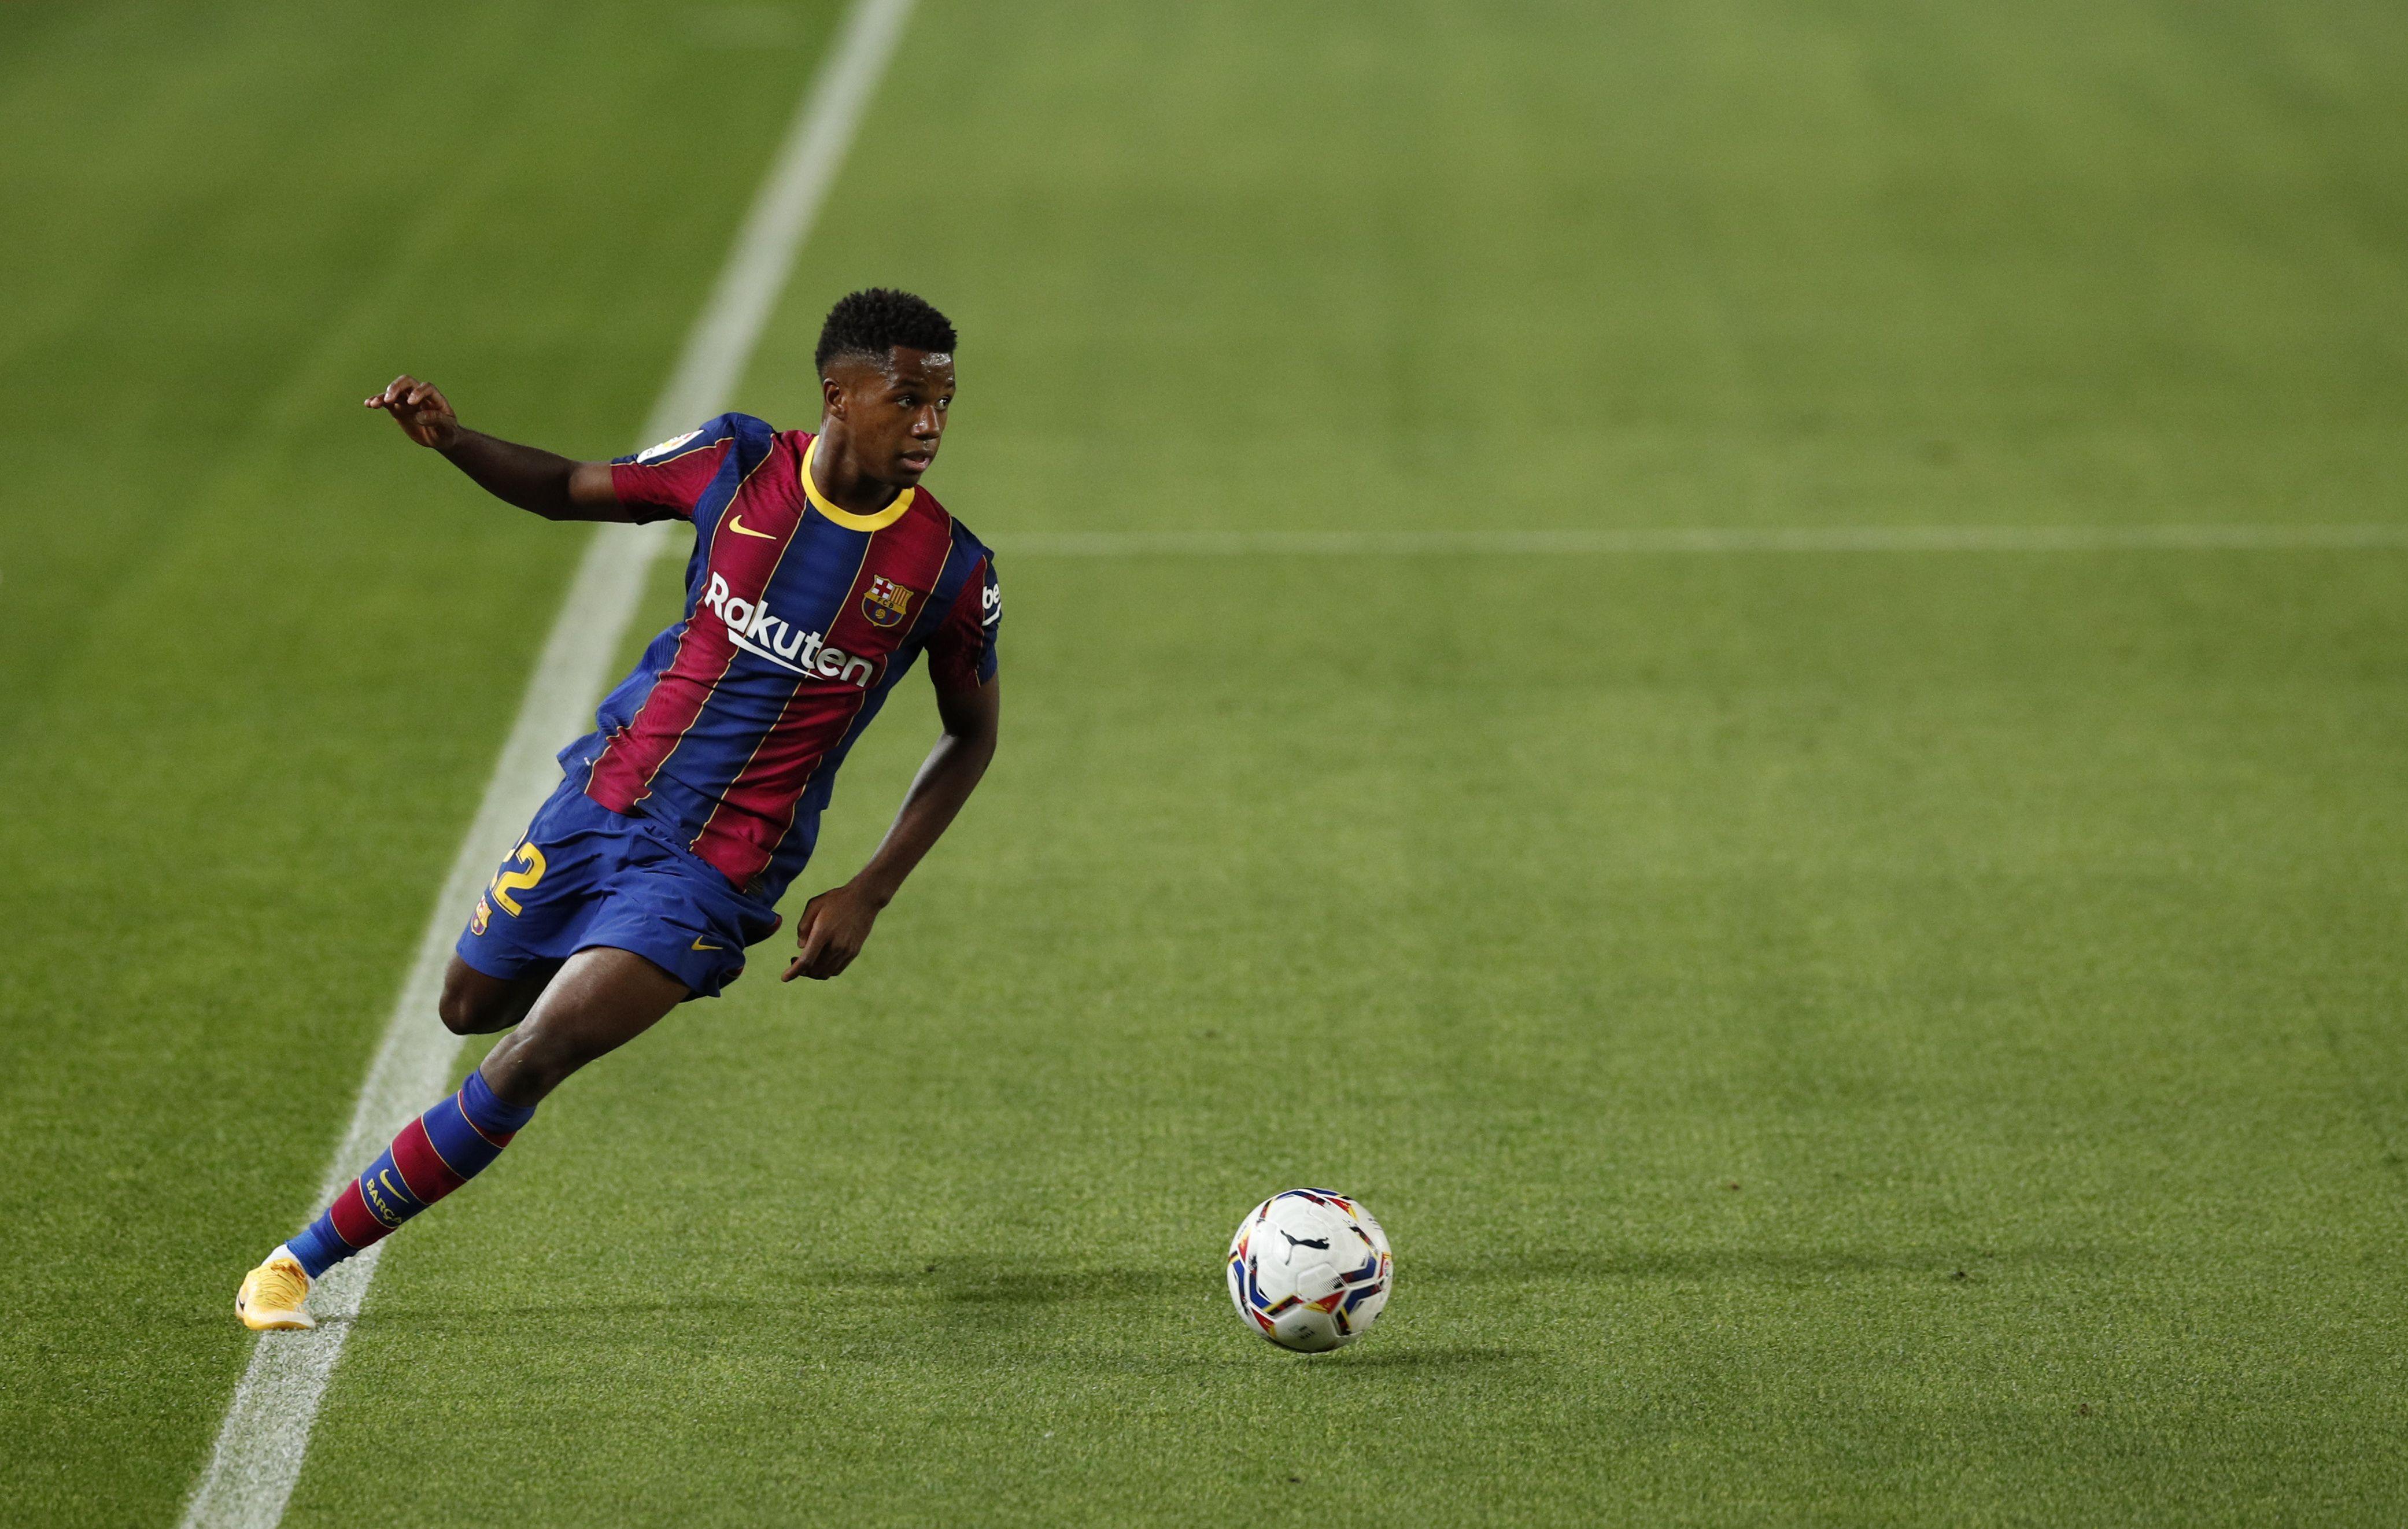 Ansu Fati lleva 5 goles en 7 partidos - REUTERS/Albert Gea